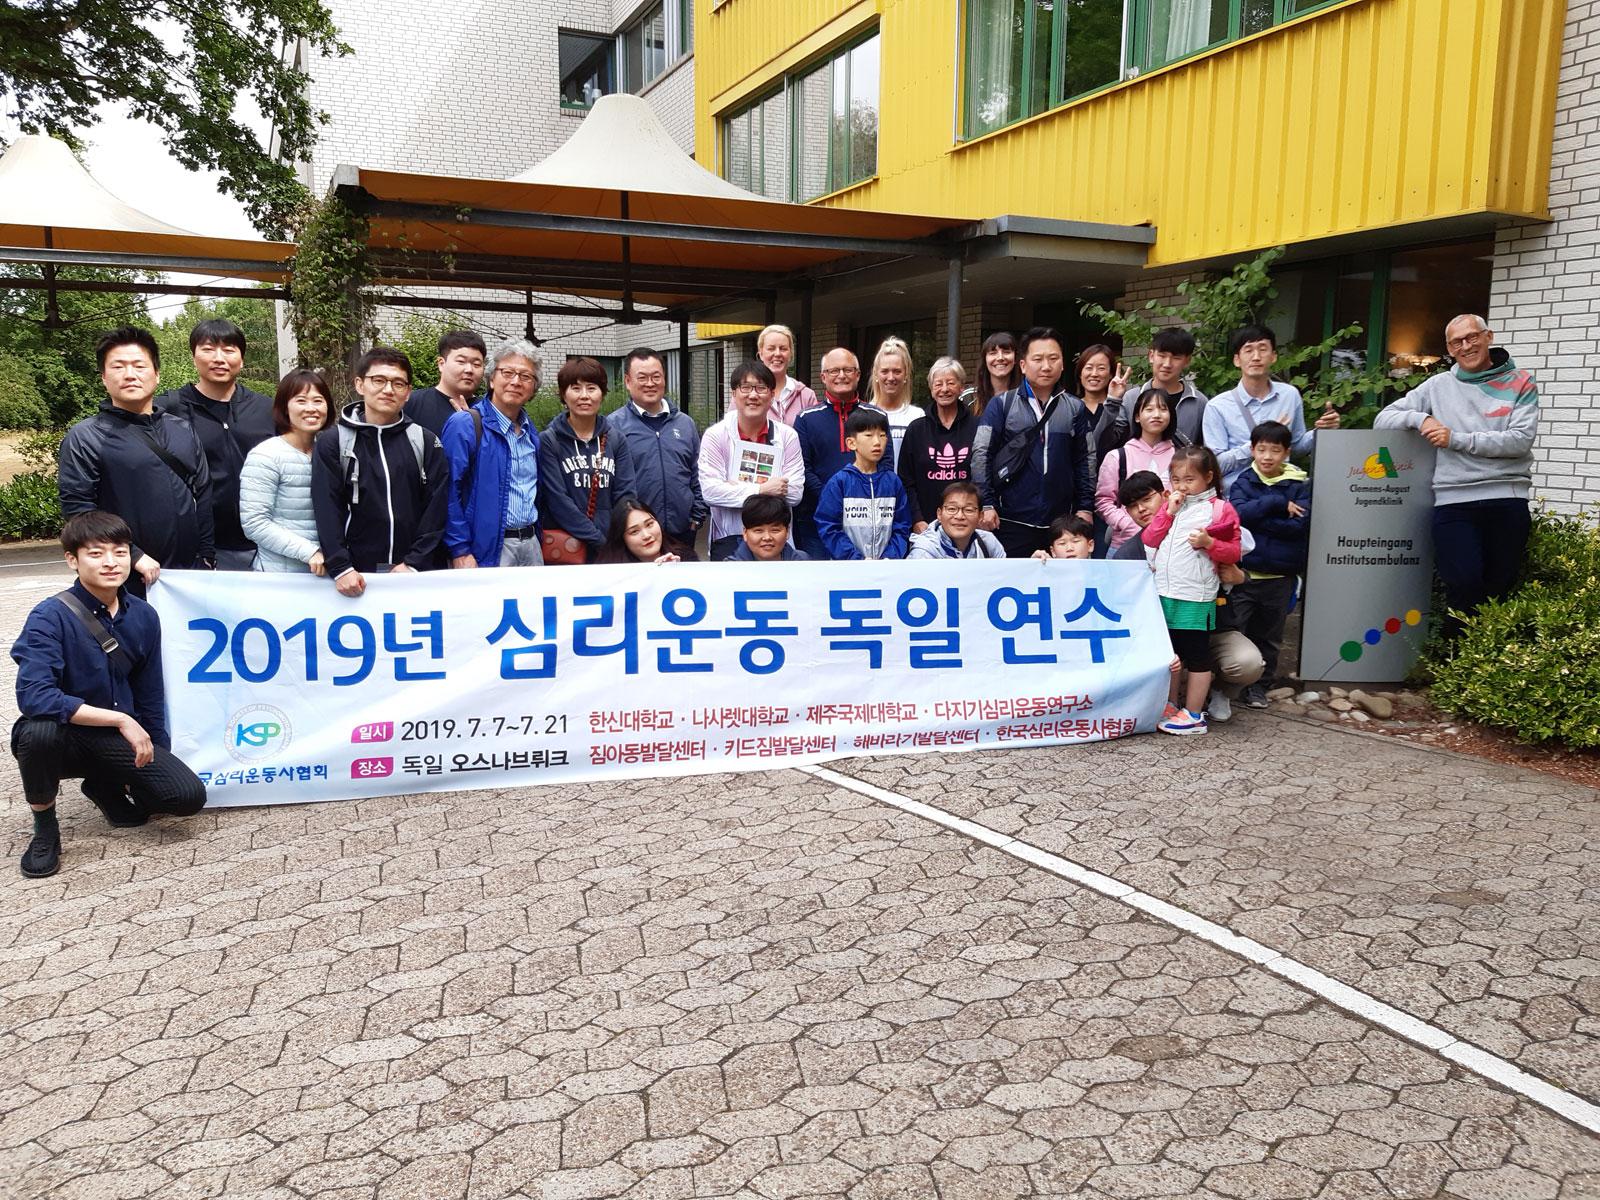 Südkoreanische Wissenschaftler in der Clemens August Jugendklinik